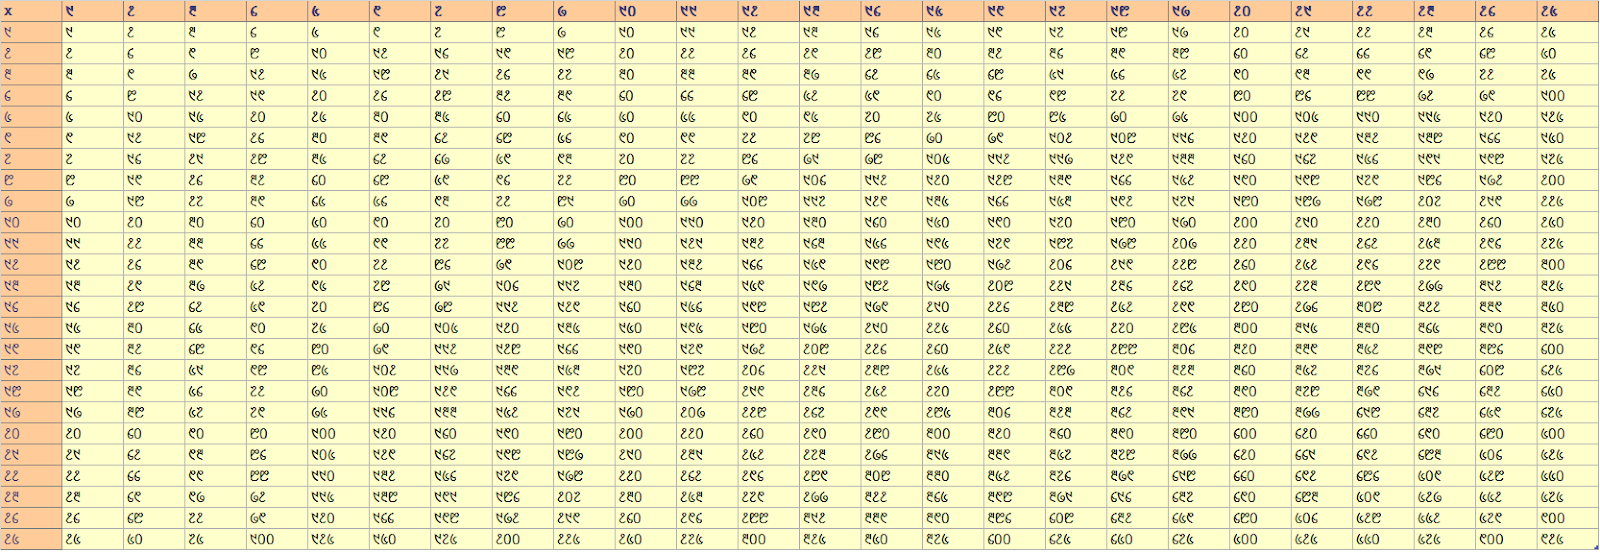 Multiplication table from 1-25 Chart in Santali (ᱥᱟᱱᱛᱟᱲᱤ ᱛᱮ ᱜᱩᱬᱚᱱ)